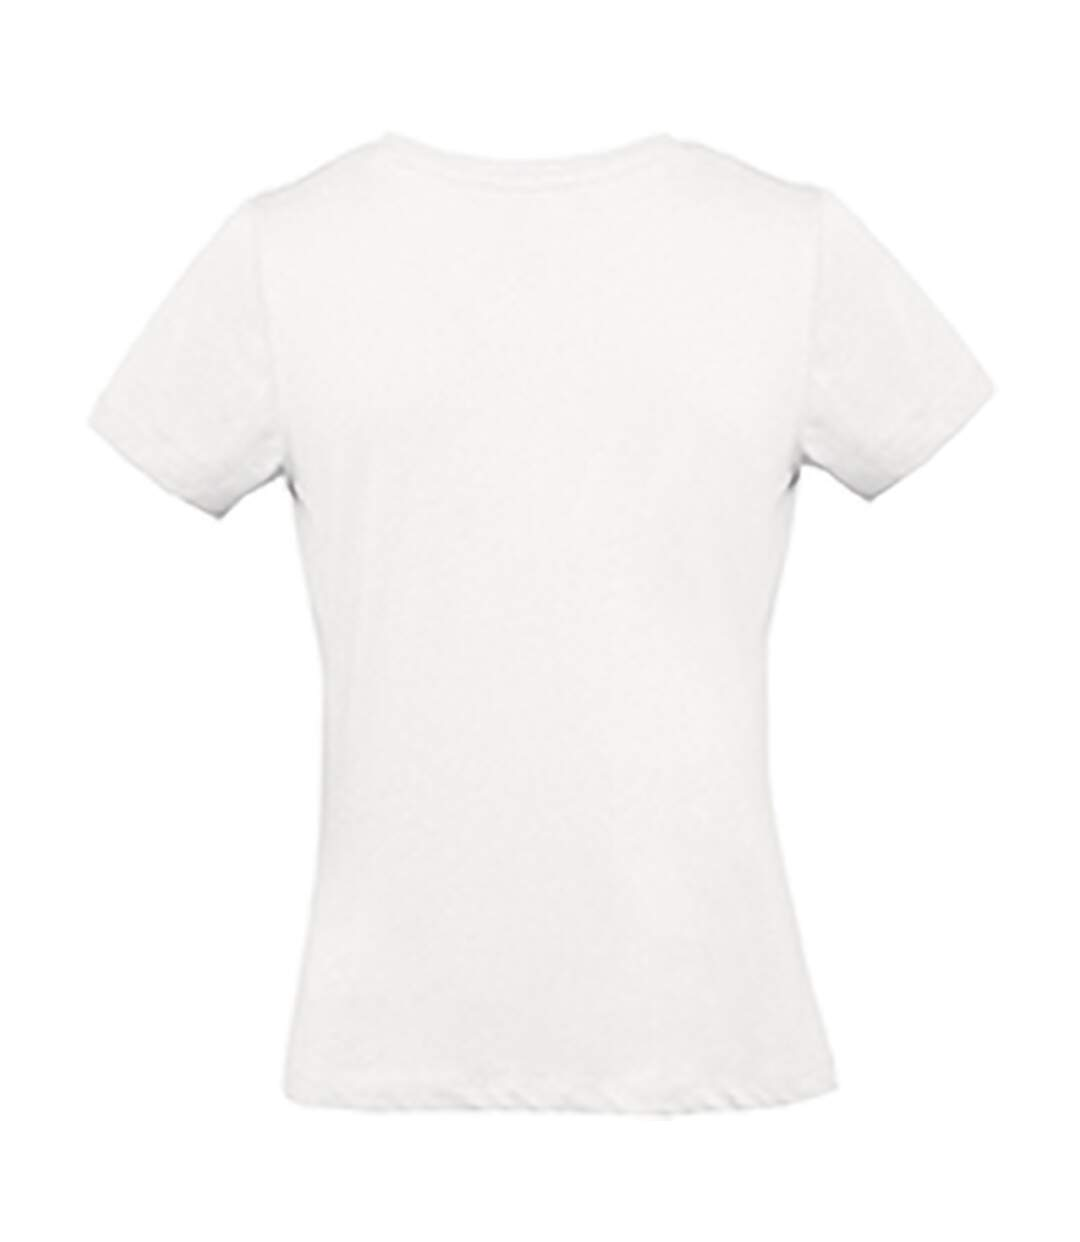 B&C -T-Shirt Inspire - Femme (Blanc) - UTBC3913